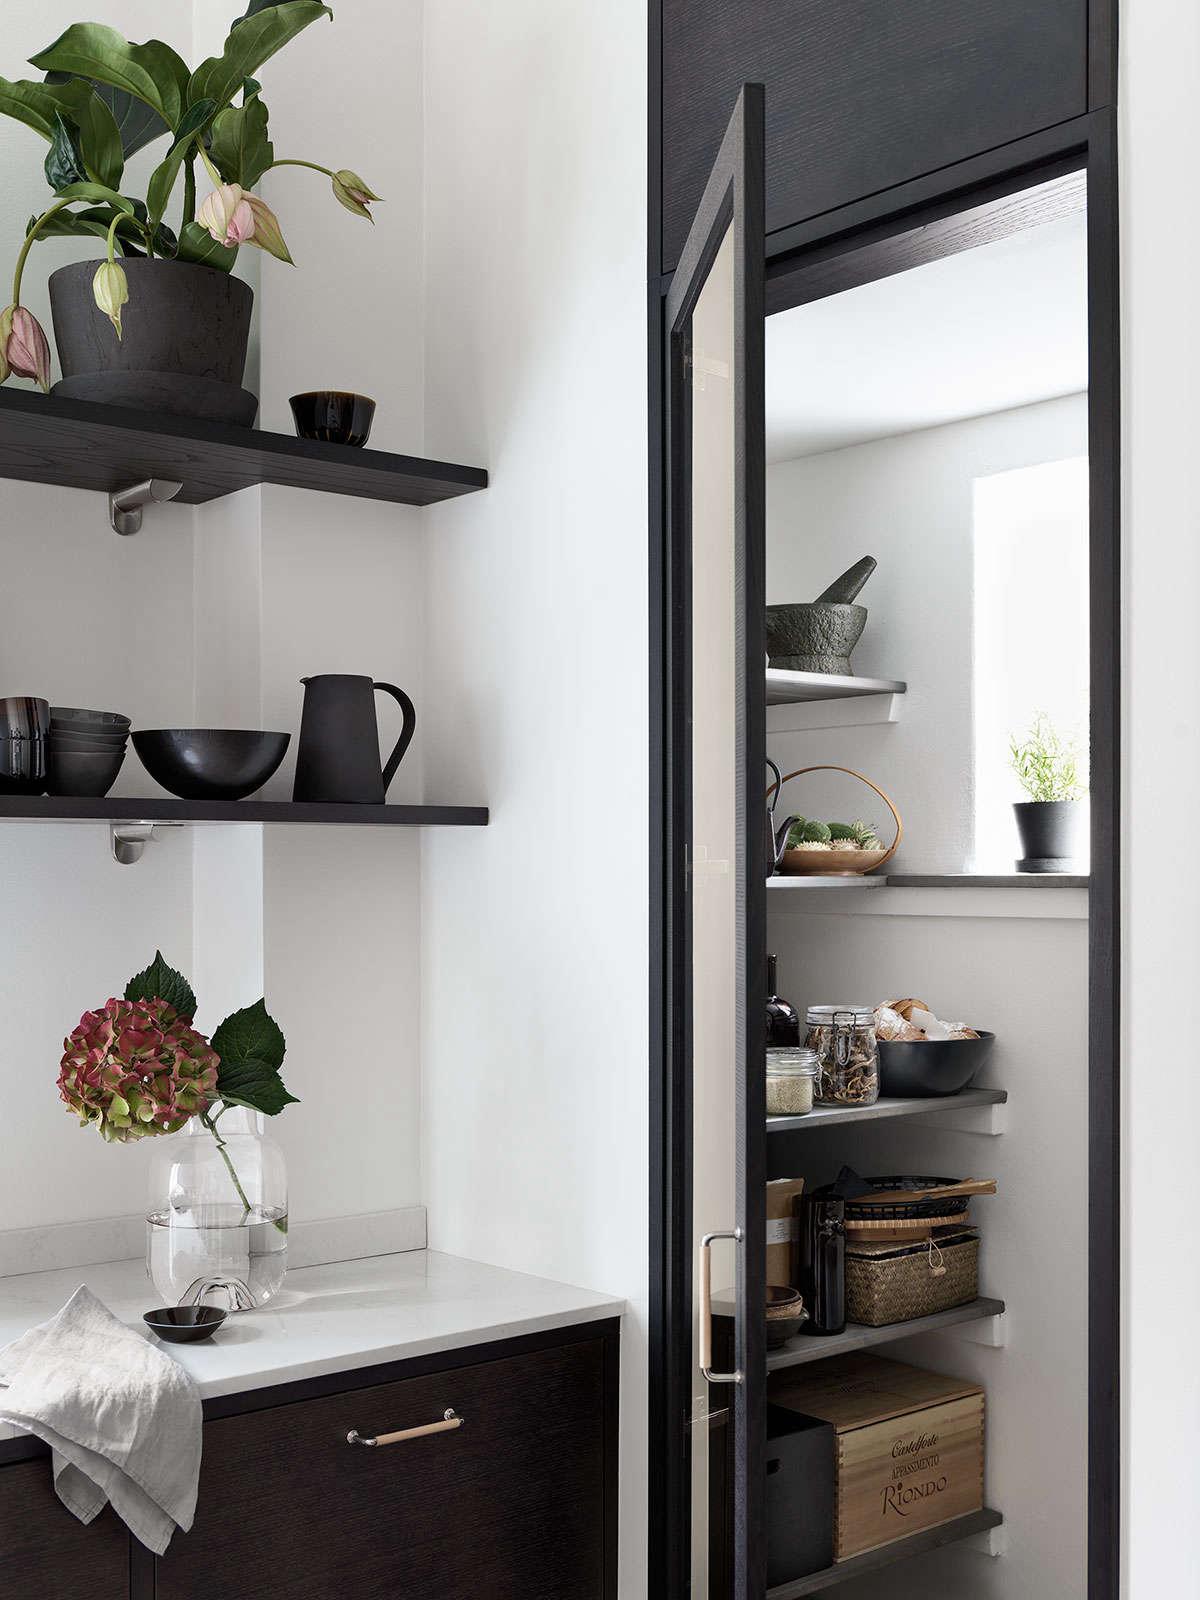 Bistro-kitchen-in-ash-brown-by-Ballingslov-of-Sweden-Remodelista-4